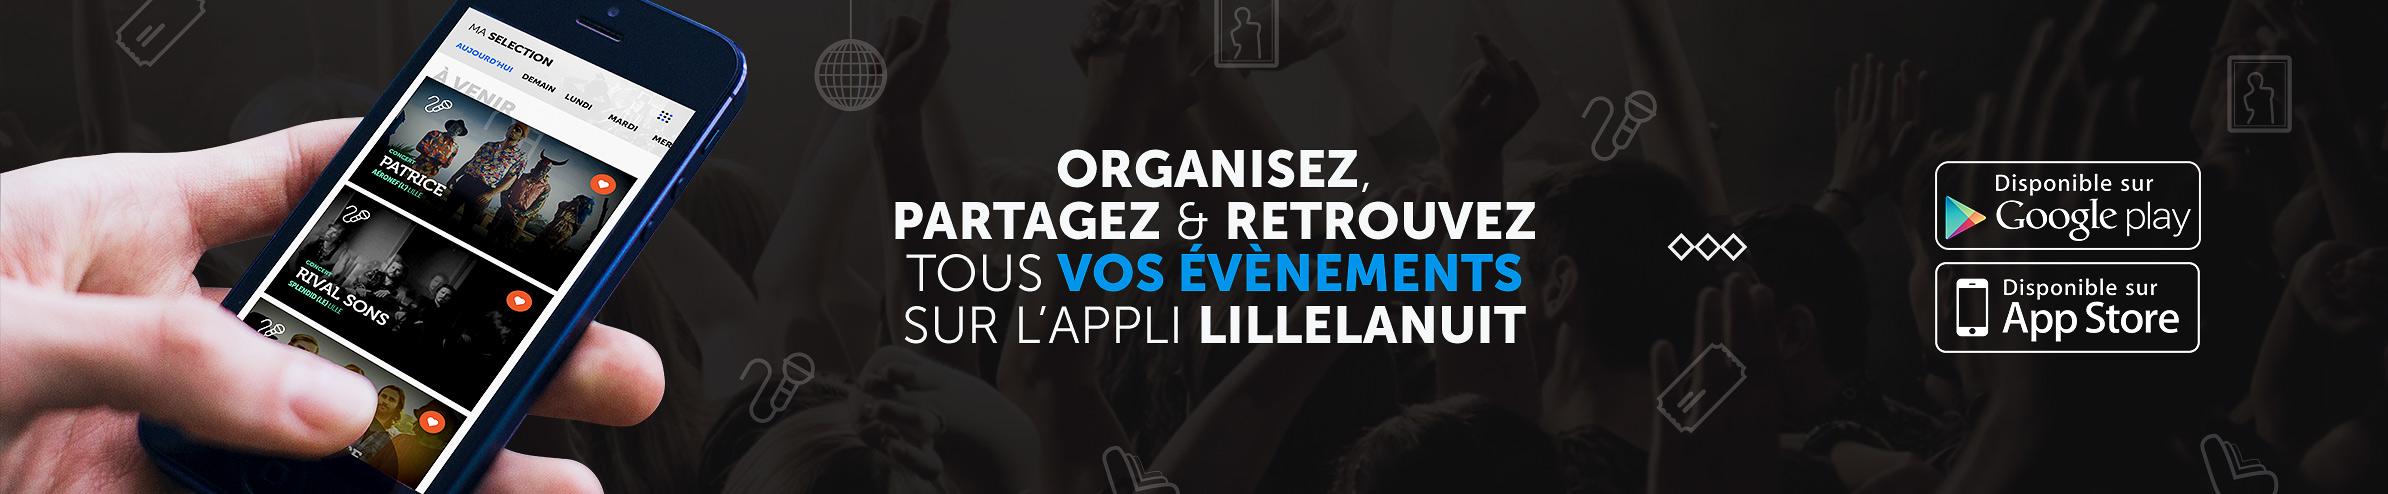 Application LillelaNuit